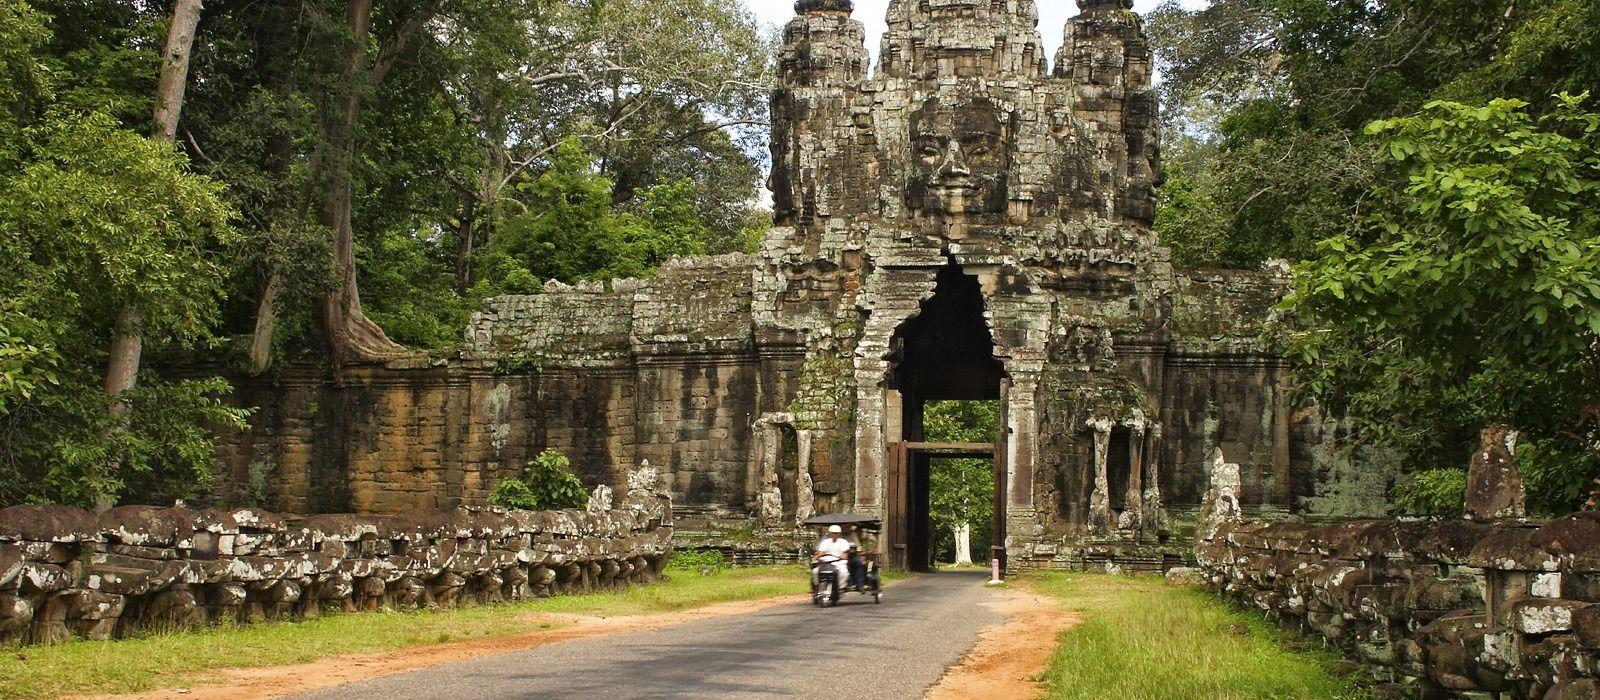 Reiseziel Kompong Thom Kambodscha